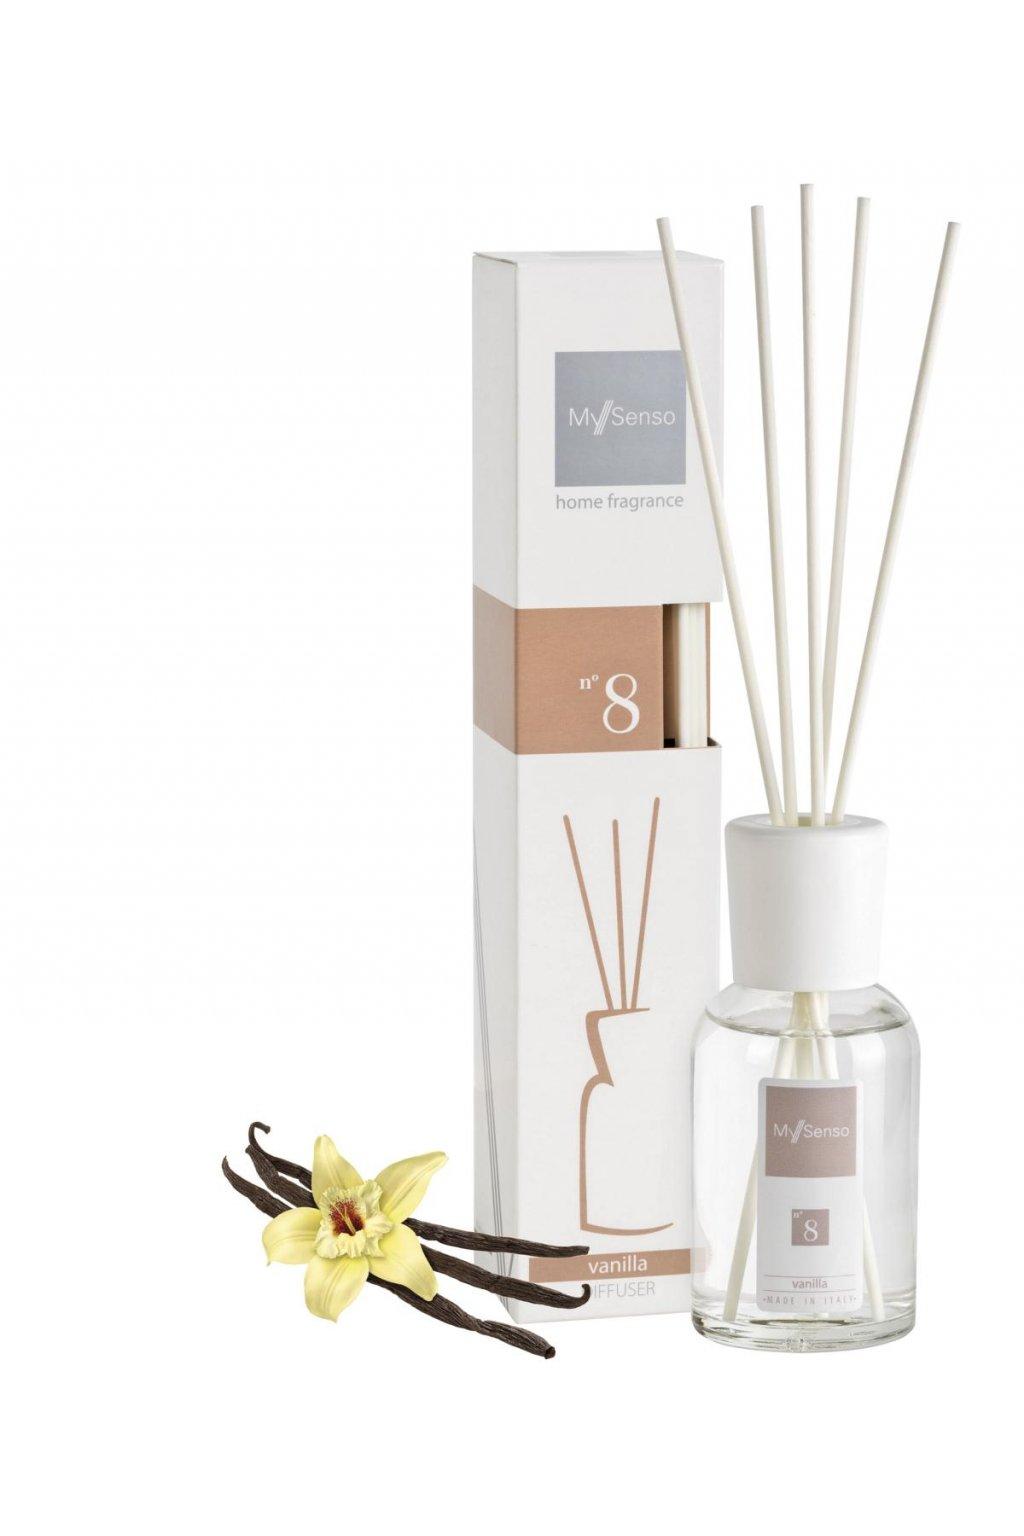 78 my senso aromaticky difuzer midi 100ml n 8 vanilla vanilka